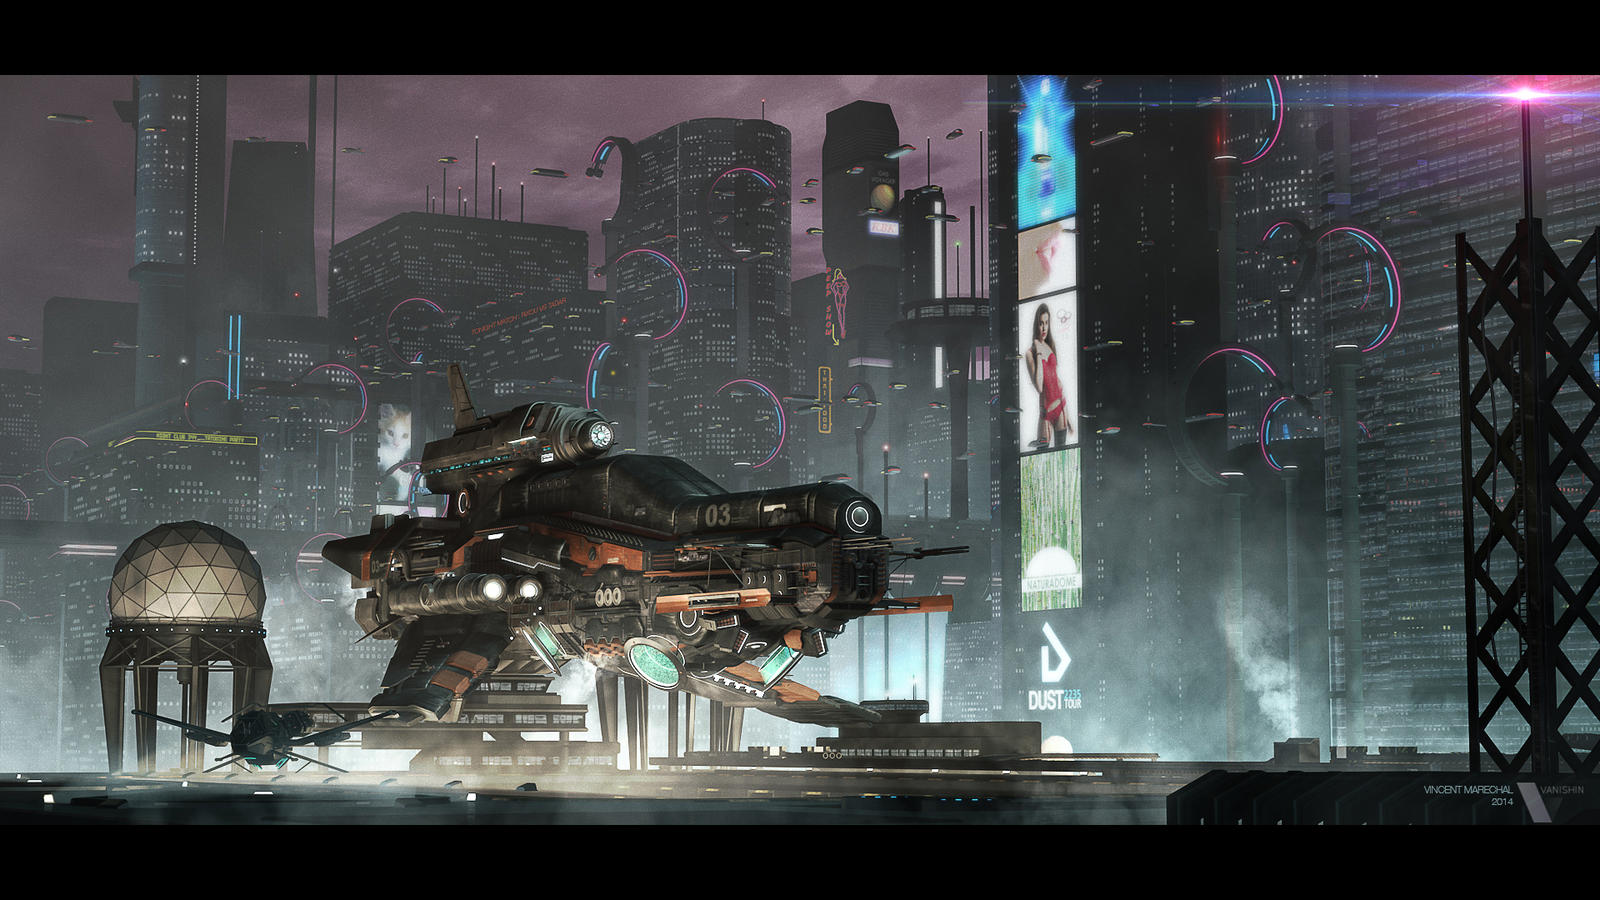 U-kalanda - Futuristic cityscape by Vanishin